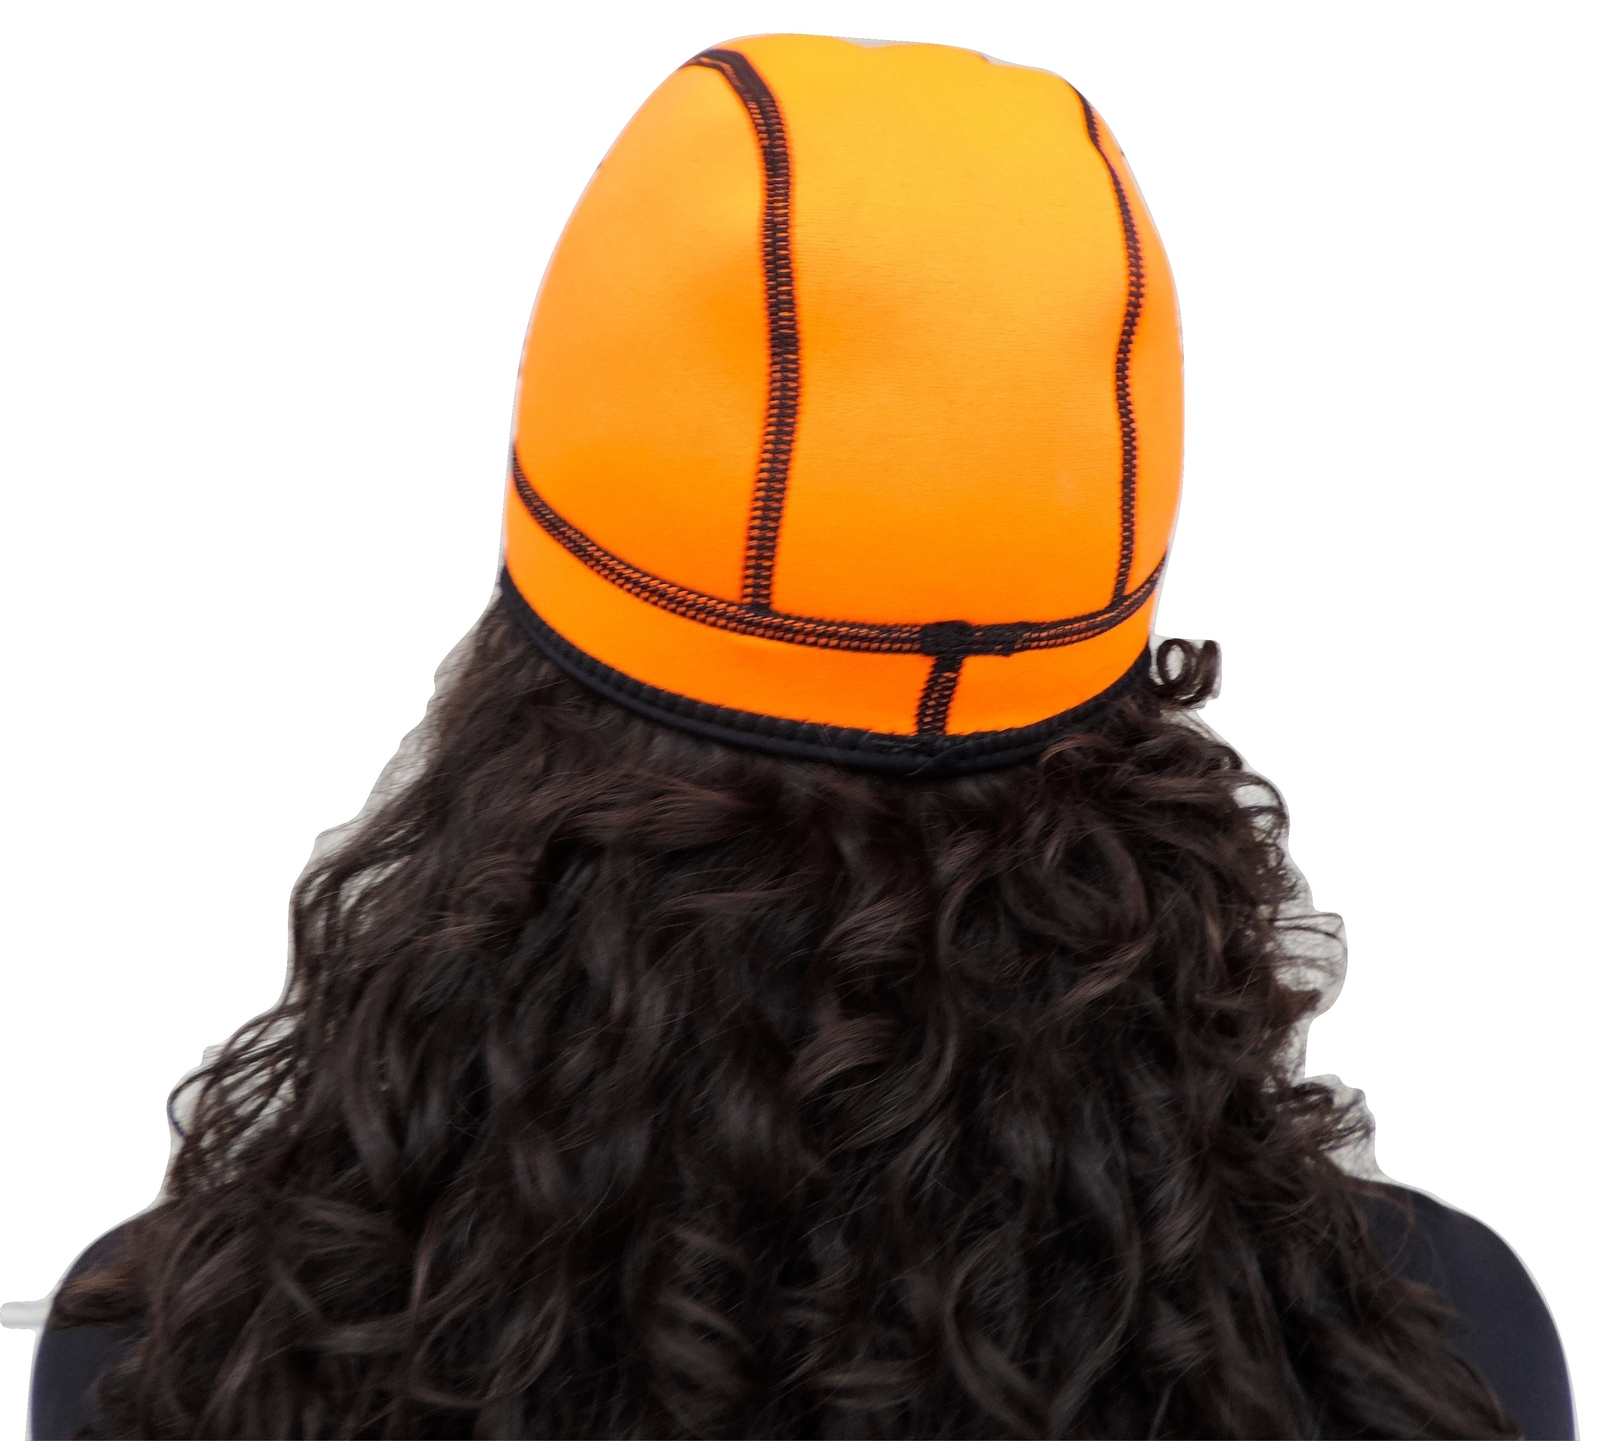 1mm Neoprene Wetsuit Beanie Cap, Bright Orange-Reversible to Black